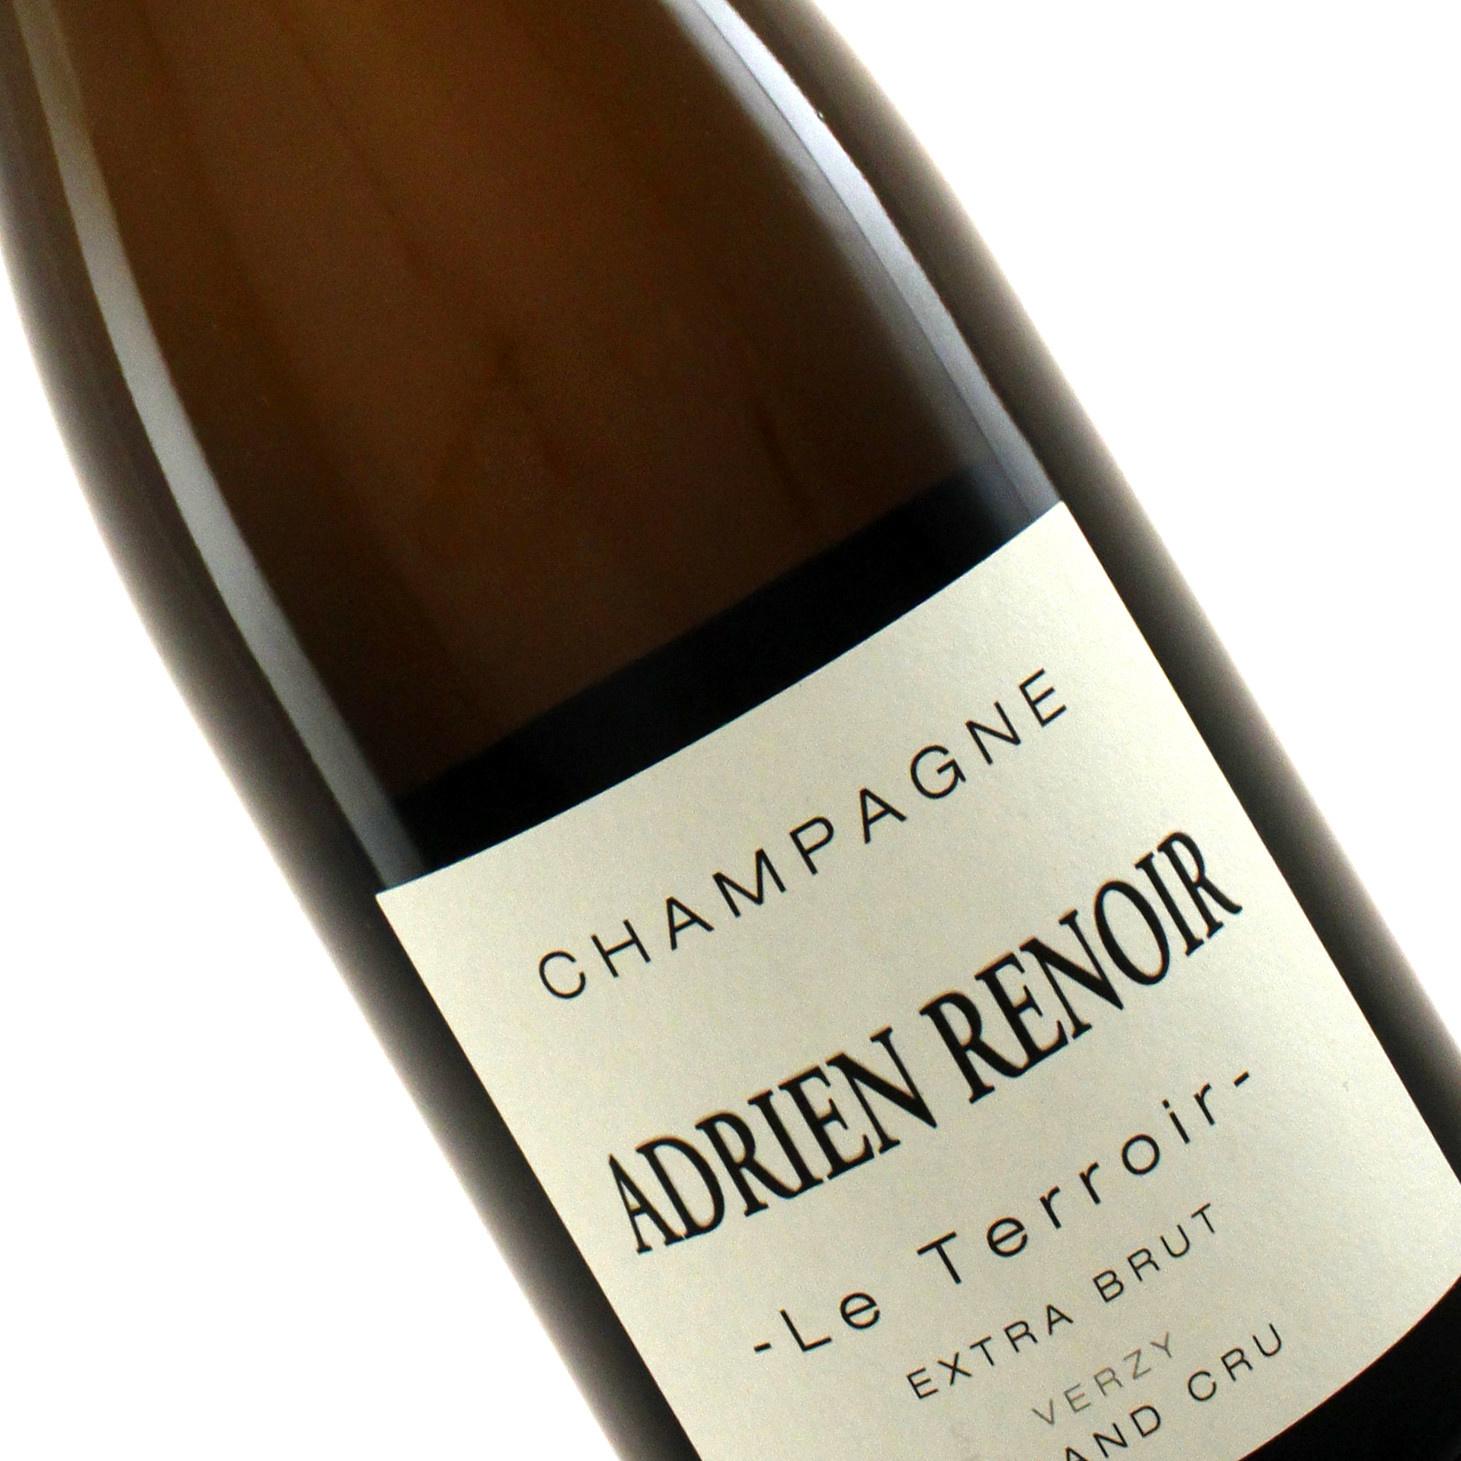 "Adrien Renoir N.V. Champagne Extra Brut Grand Cru ""Le Terroir"" , Verzy"